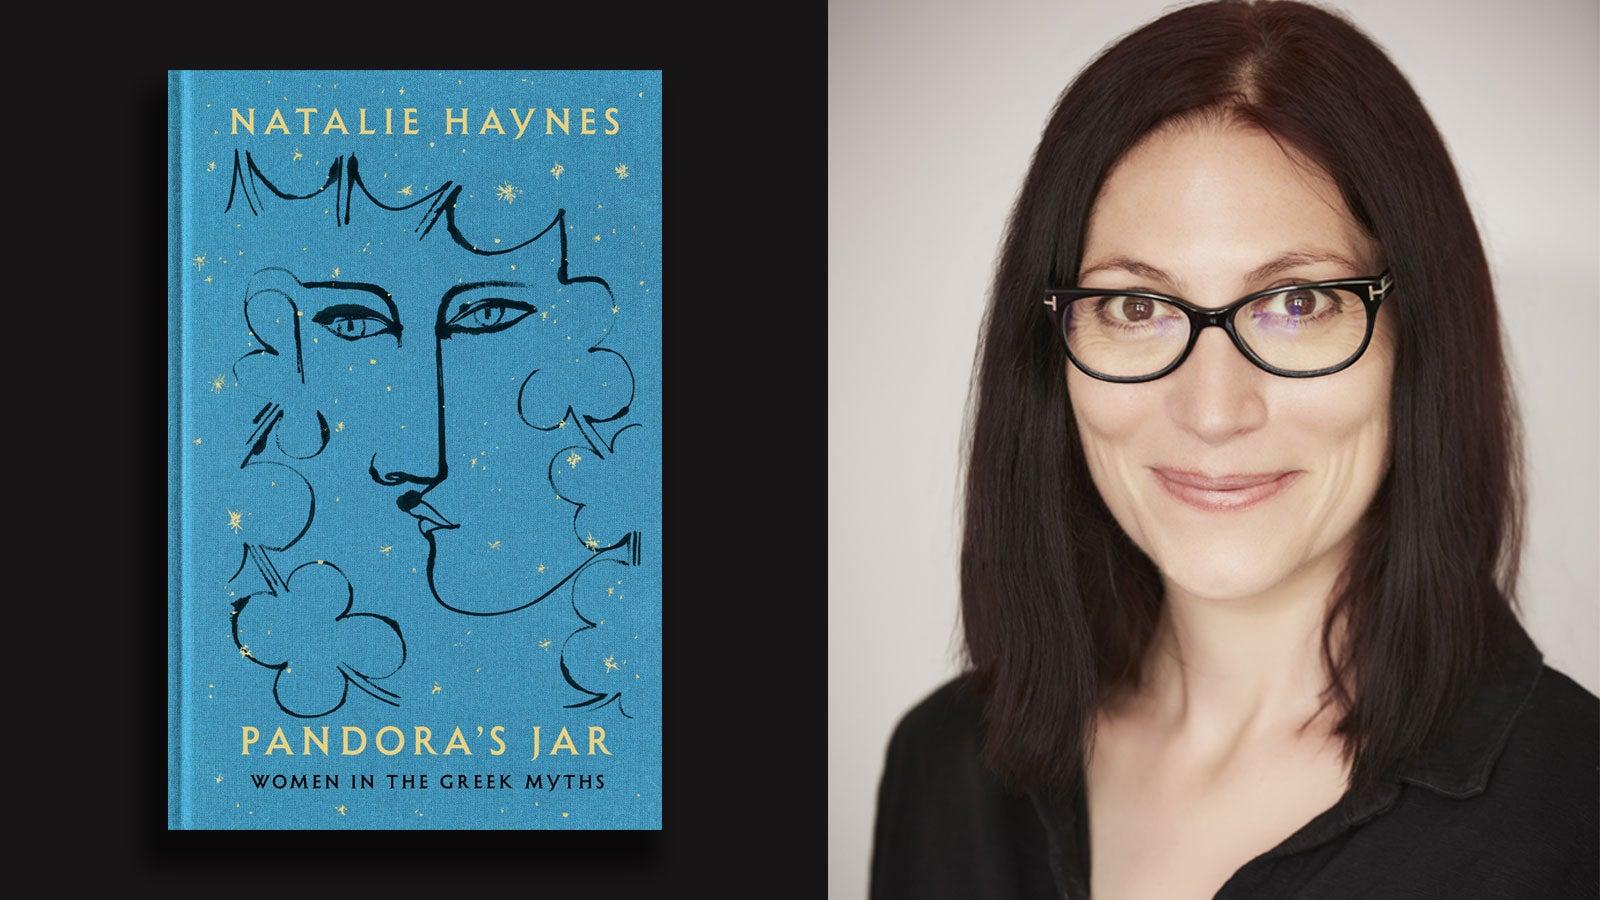 Natalie Haynes and the cover of Pandora's Jar